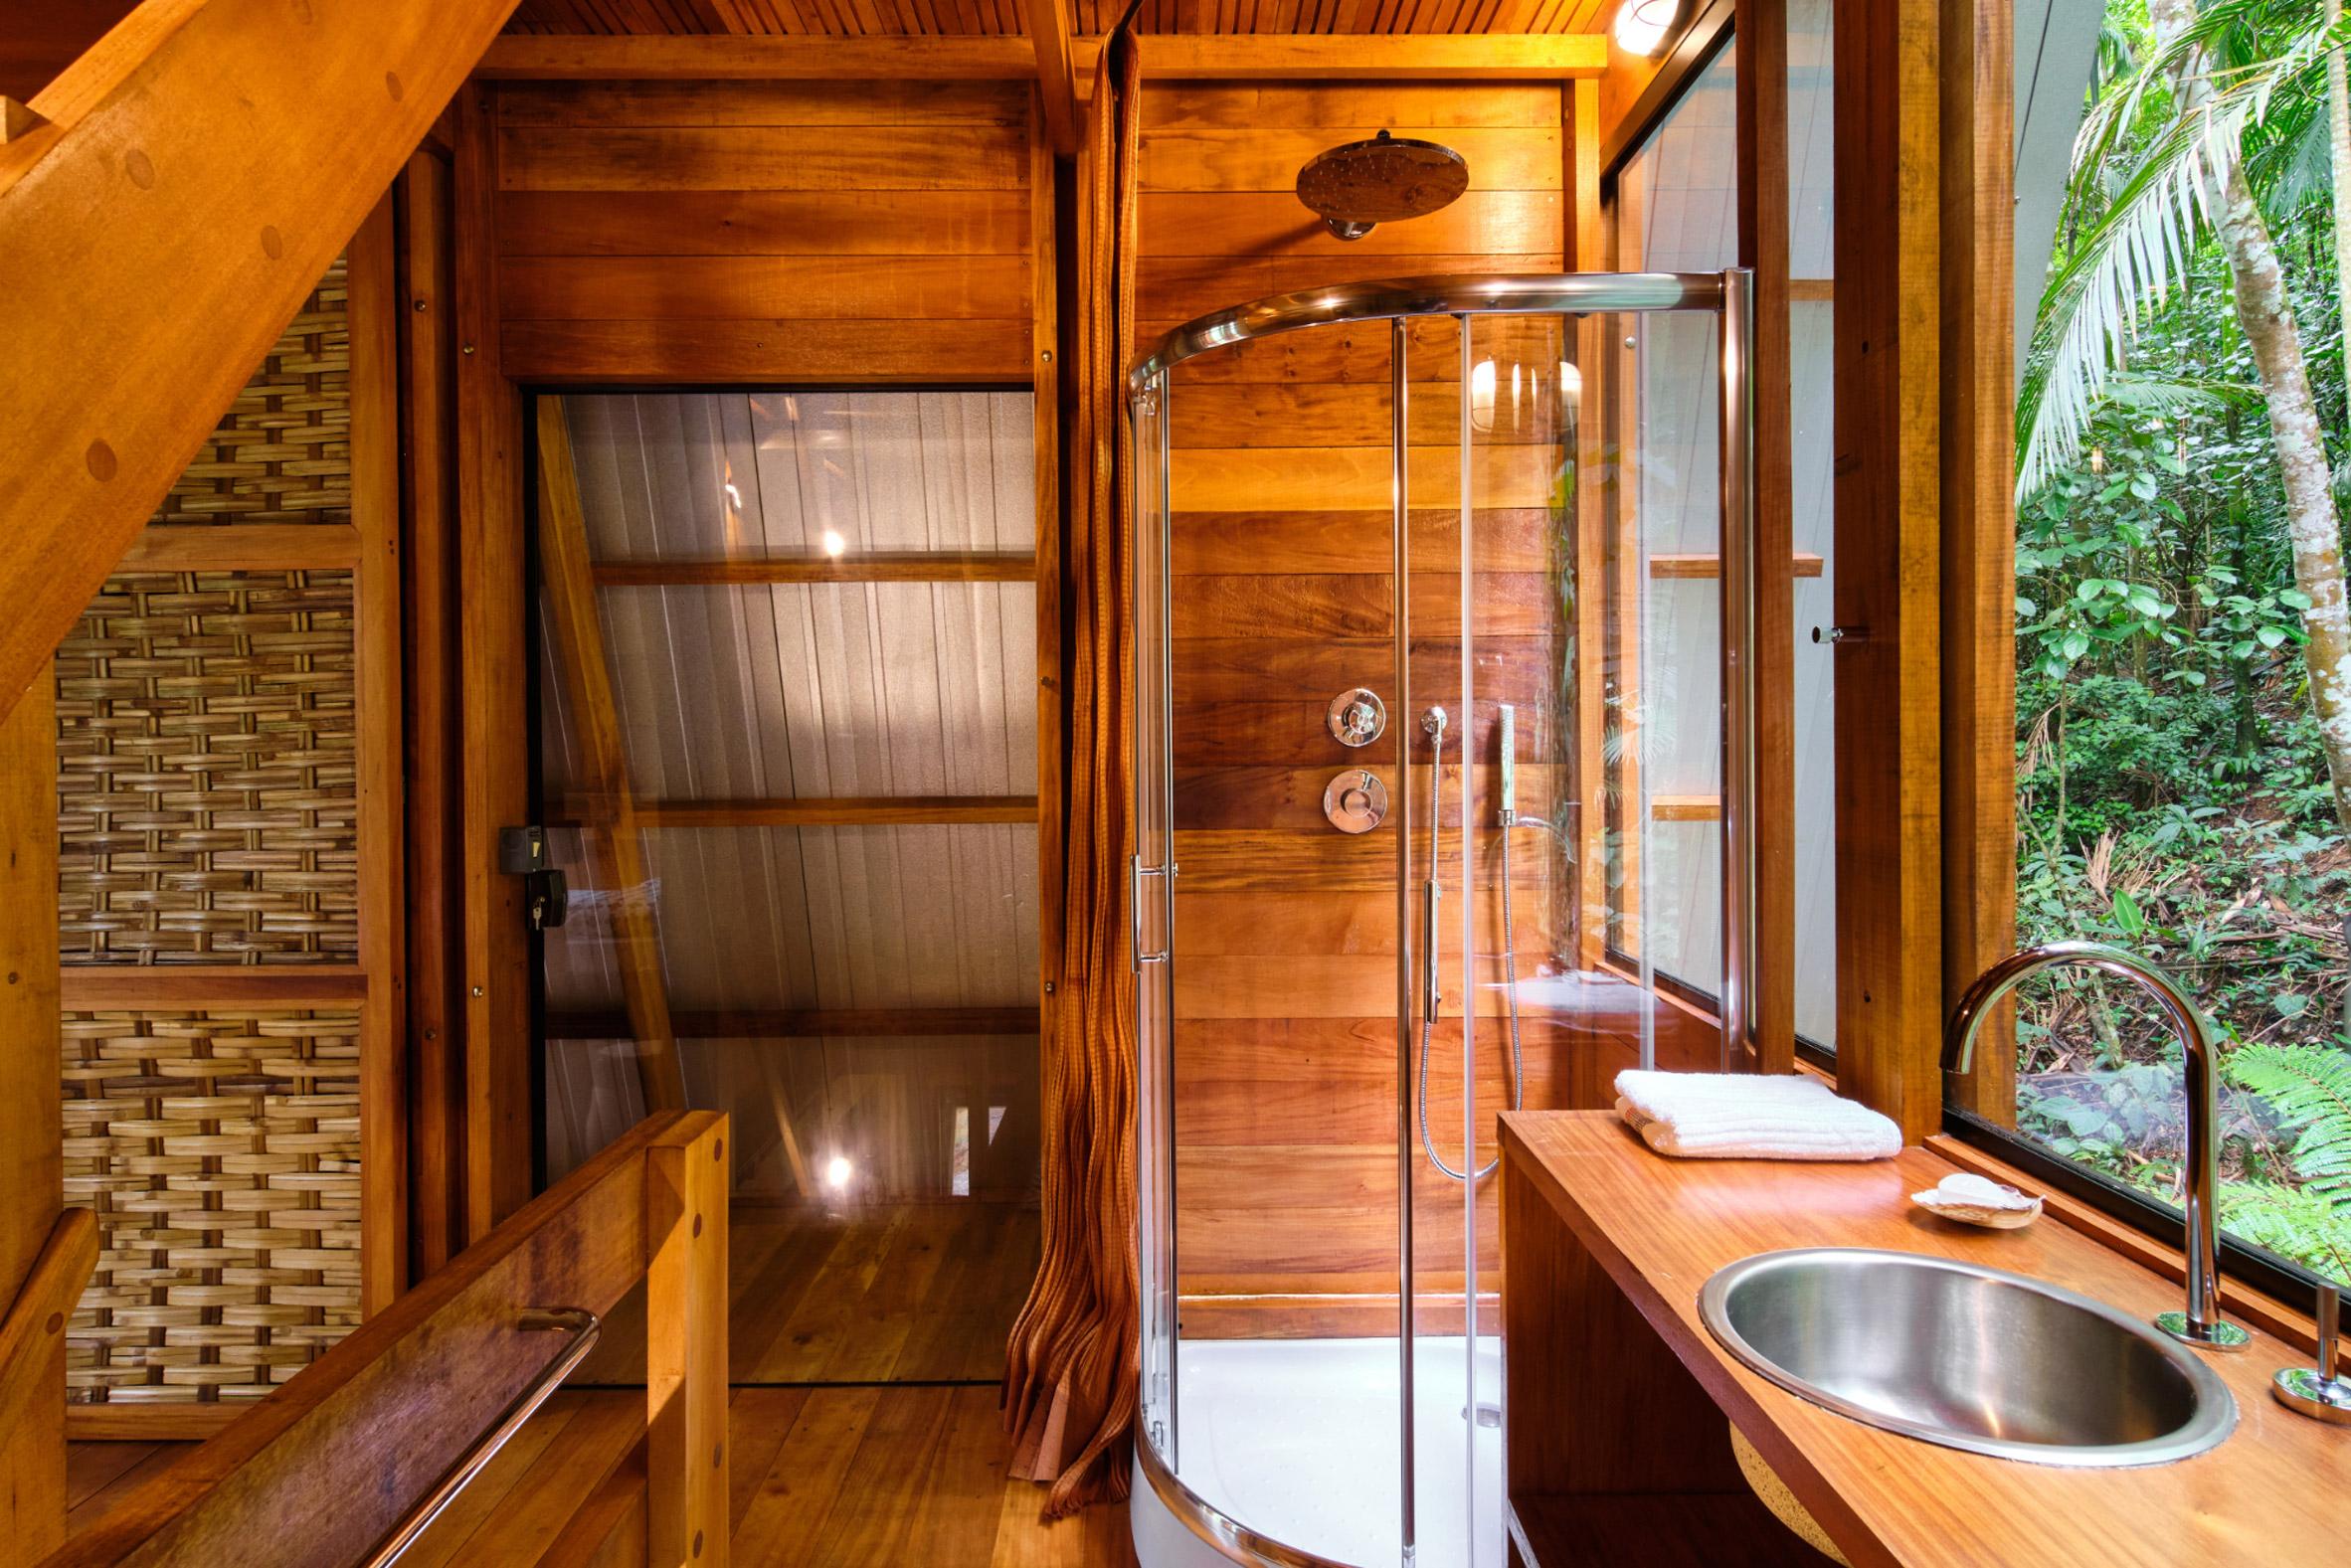 Bathroom of Monkey House cabin